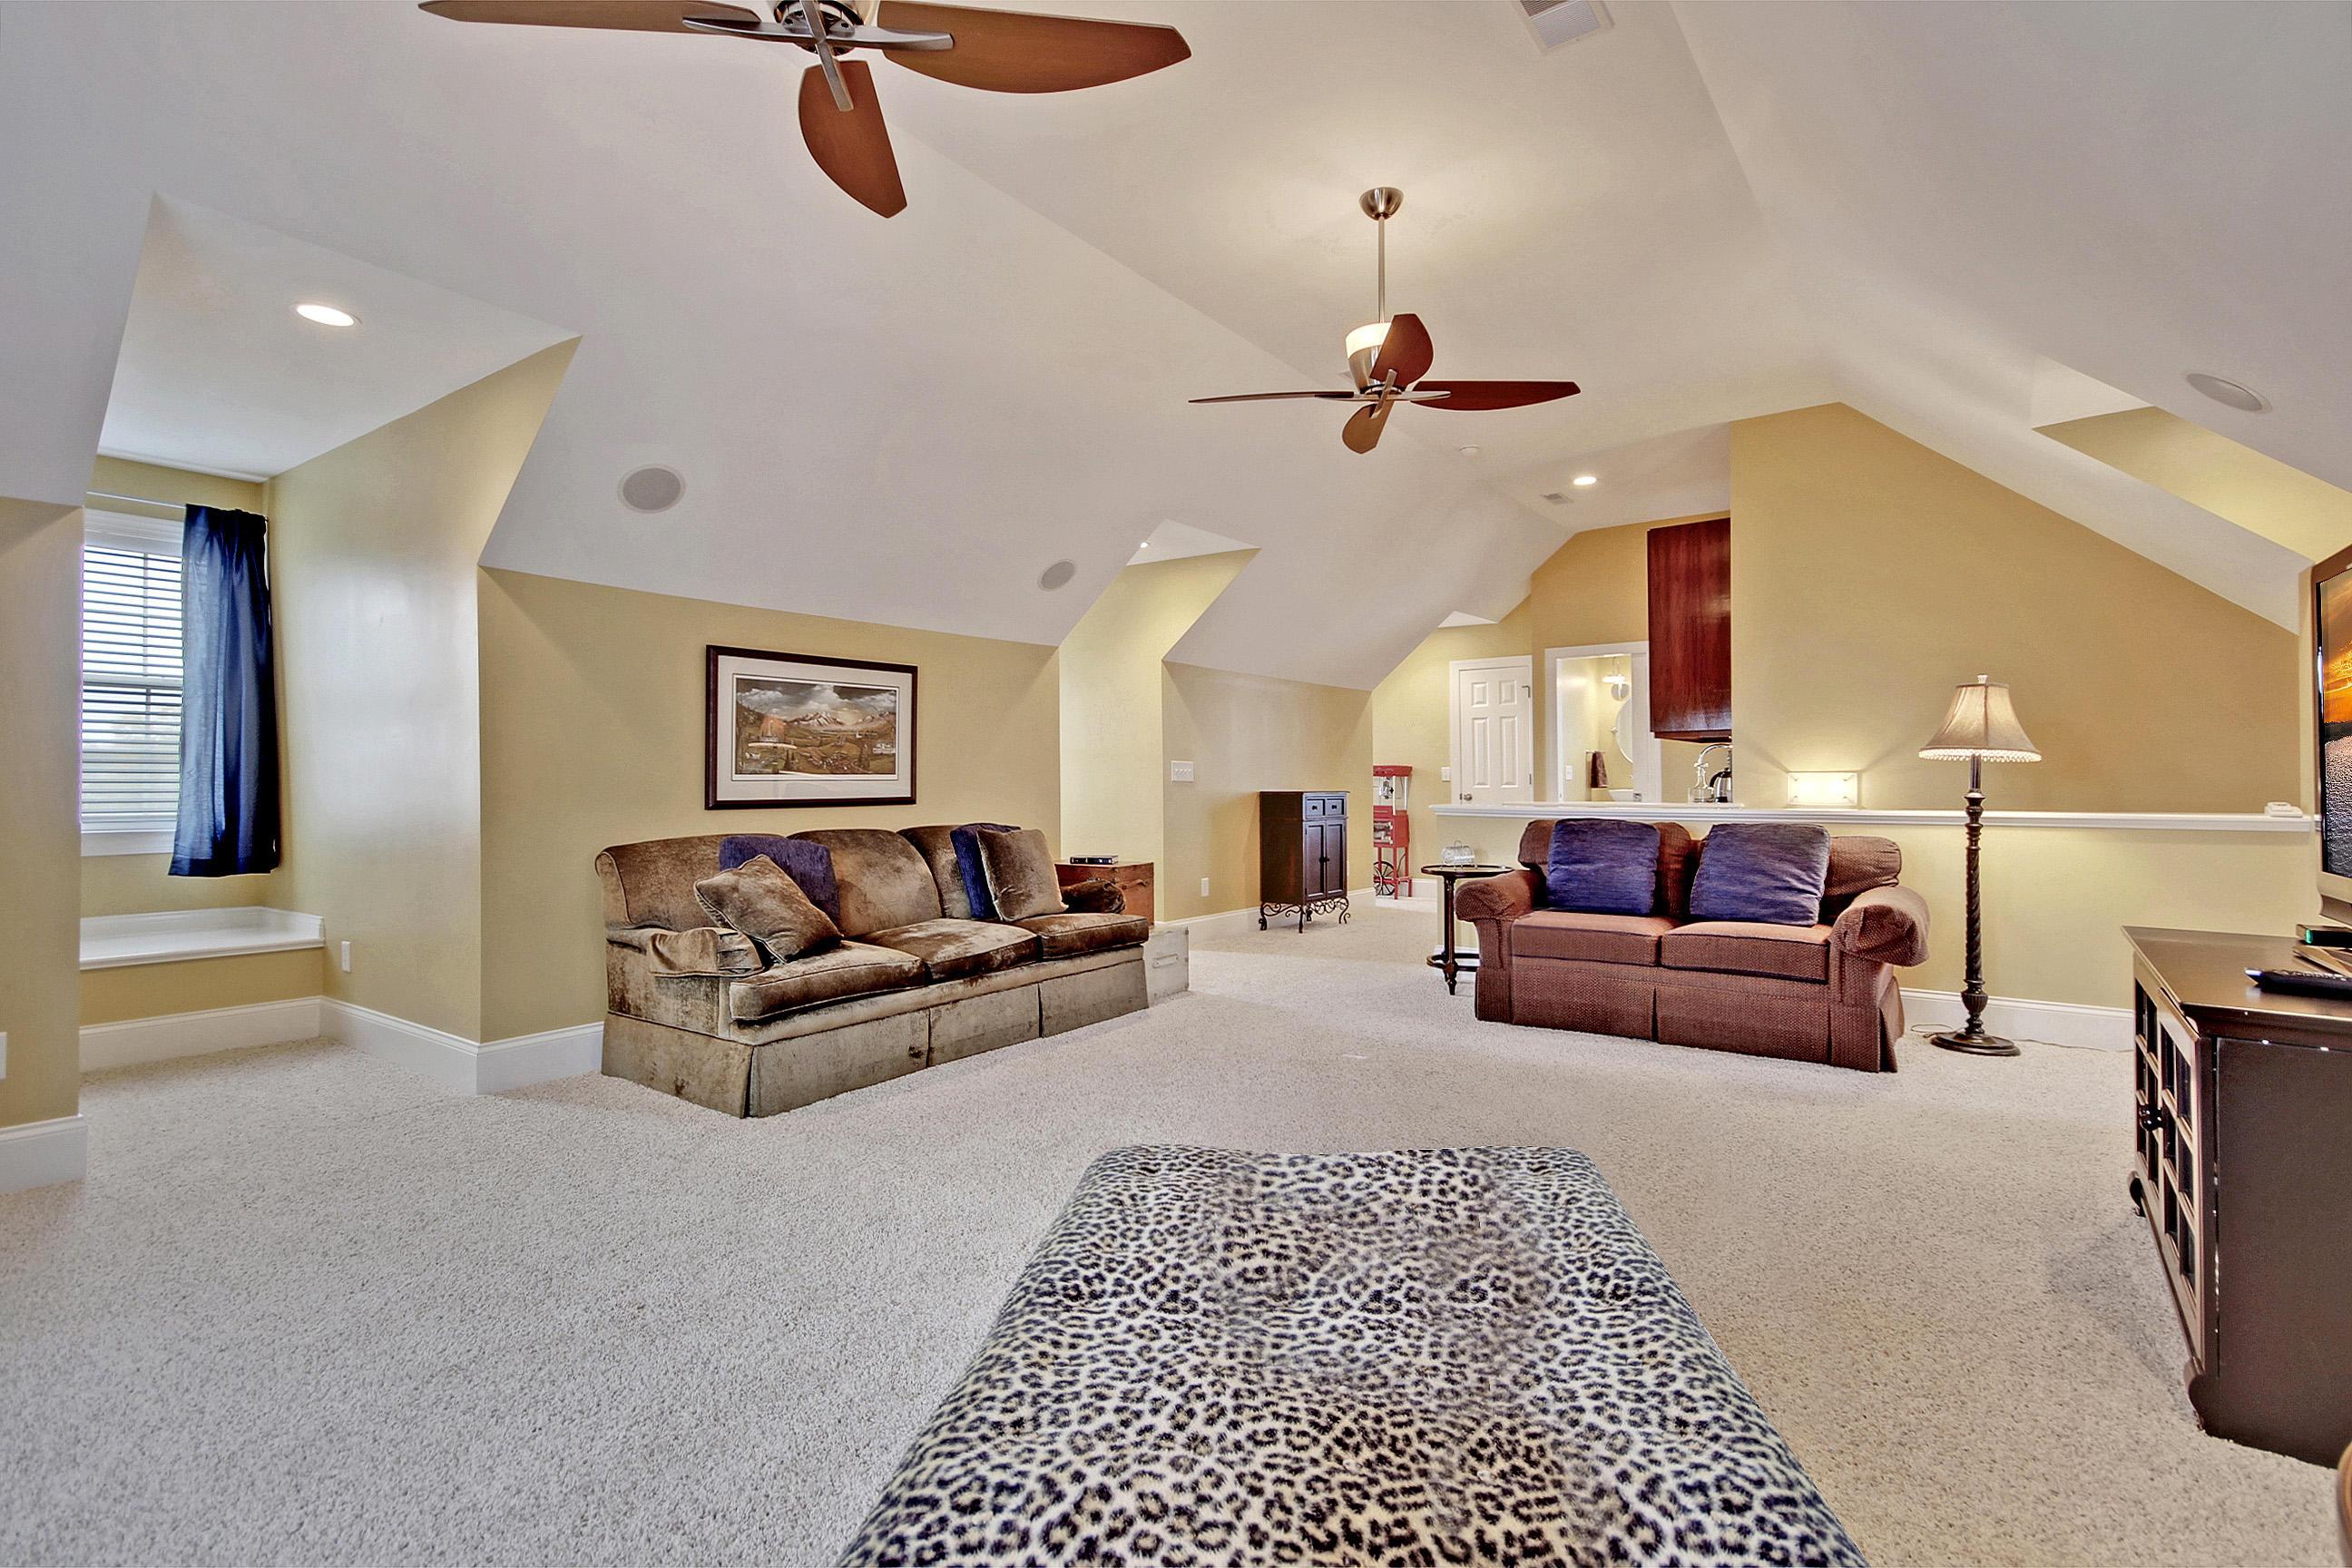 Dunes West Homes For Sale - 2364 Darts Cove, Mount Pleasant, SC - 10